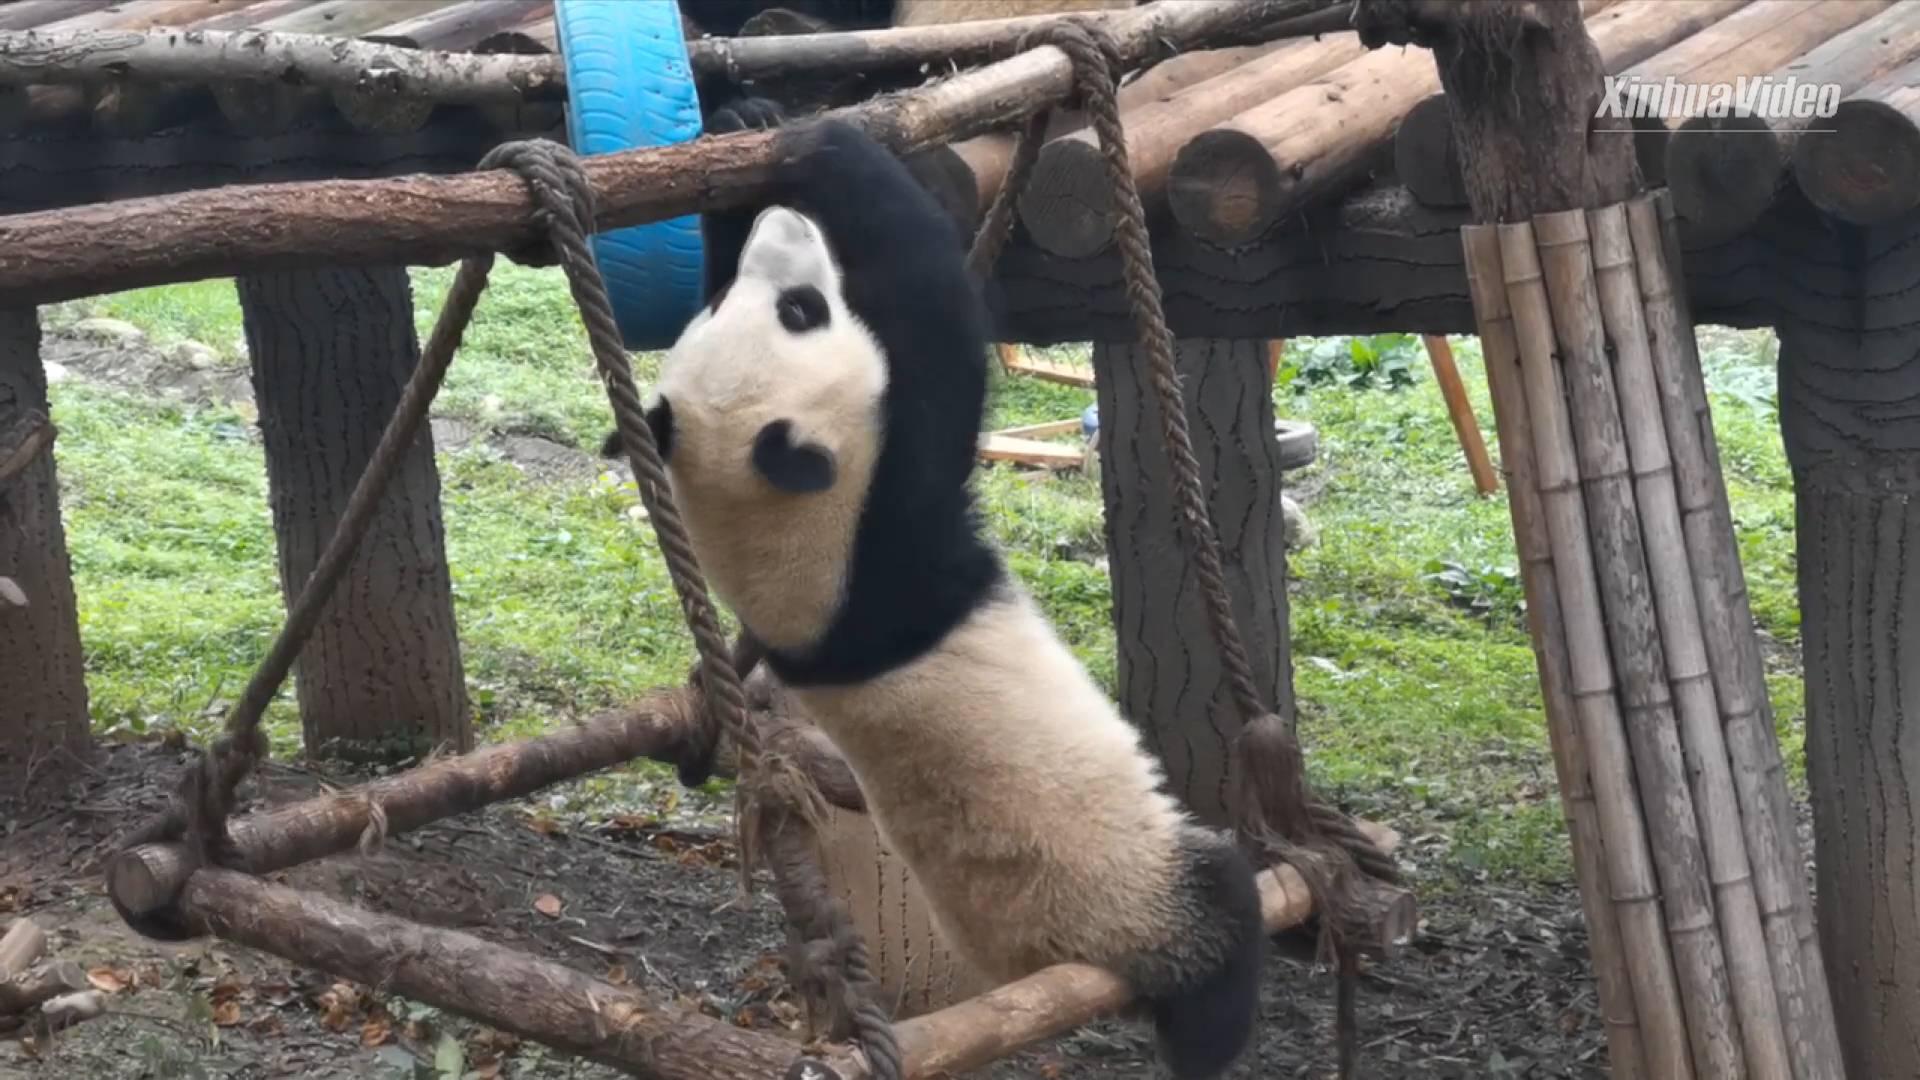 Giant panda: I'm a good horizontal bar player